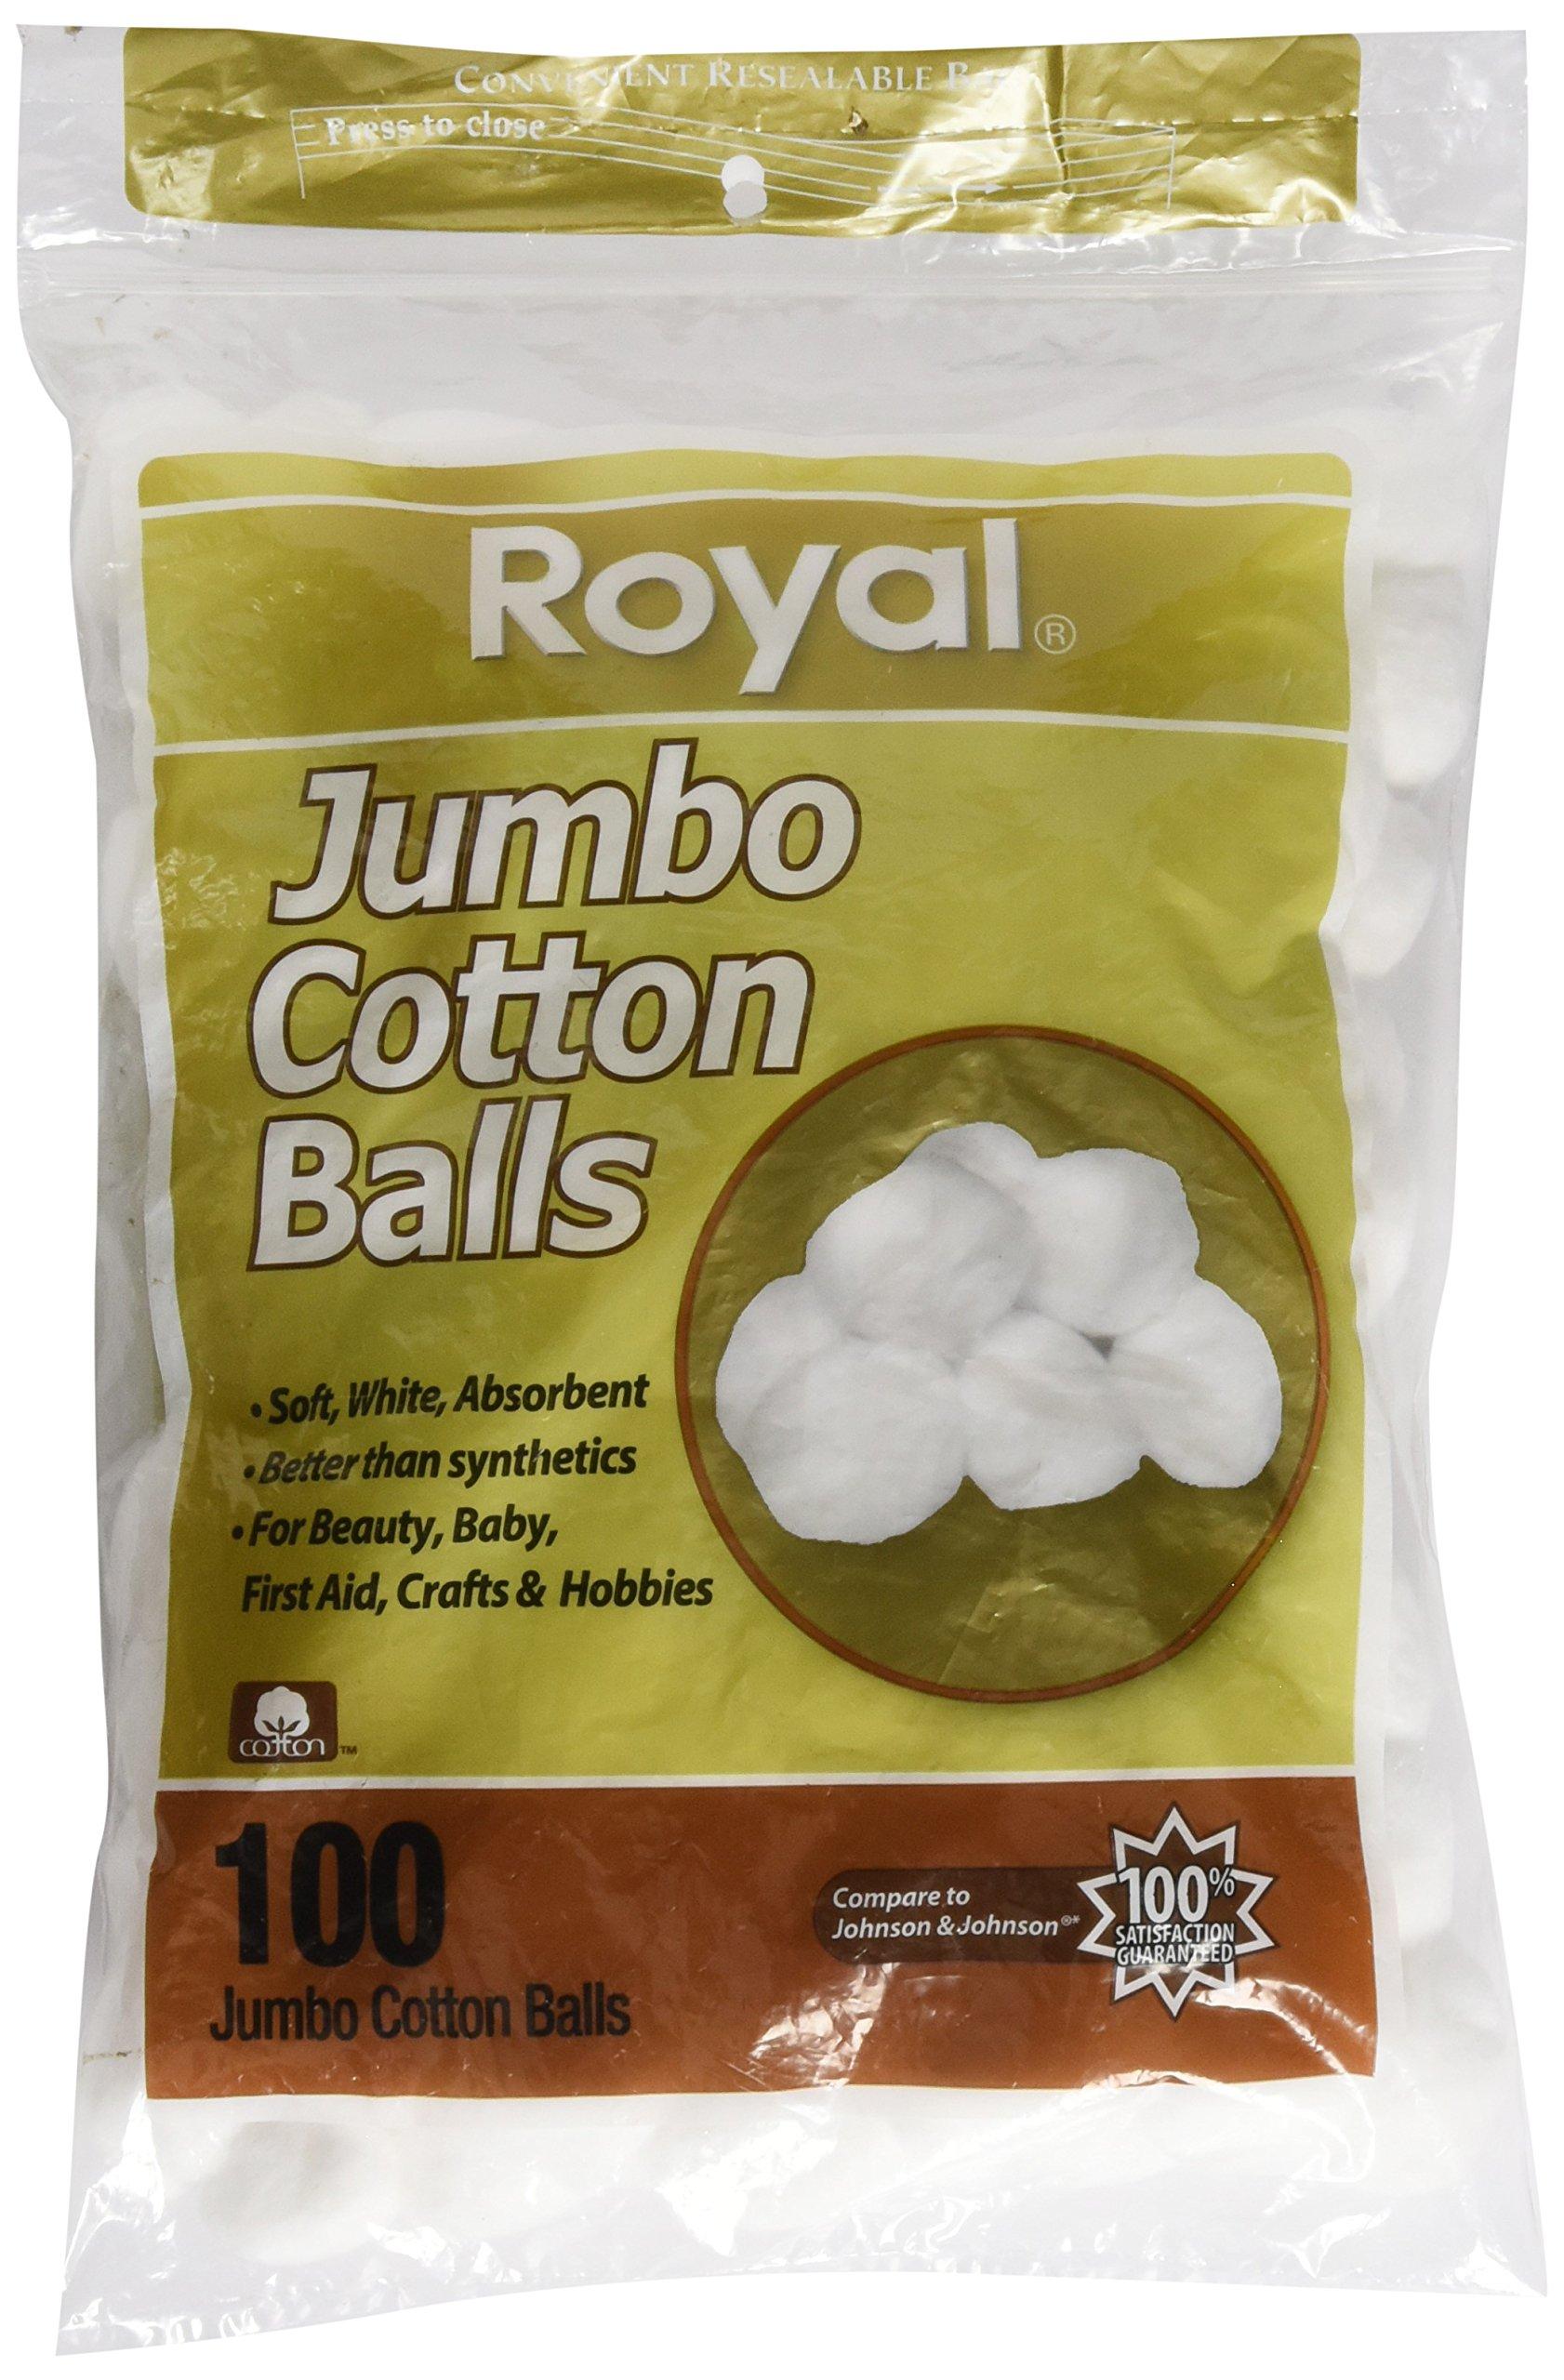 100 Count Jumbo Cotton Balls